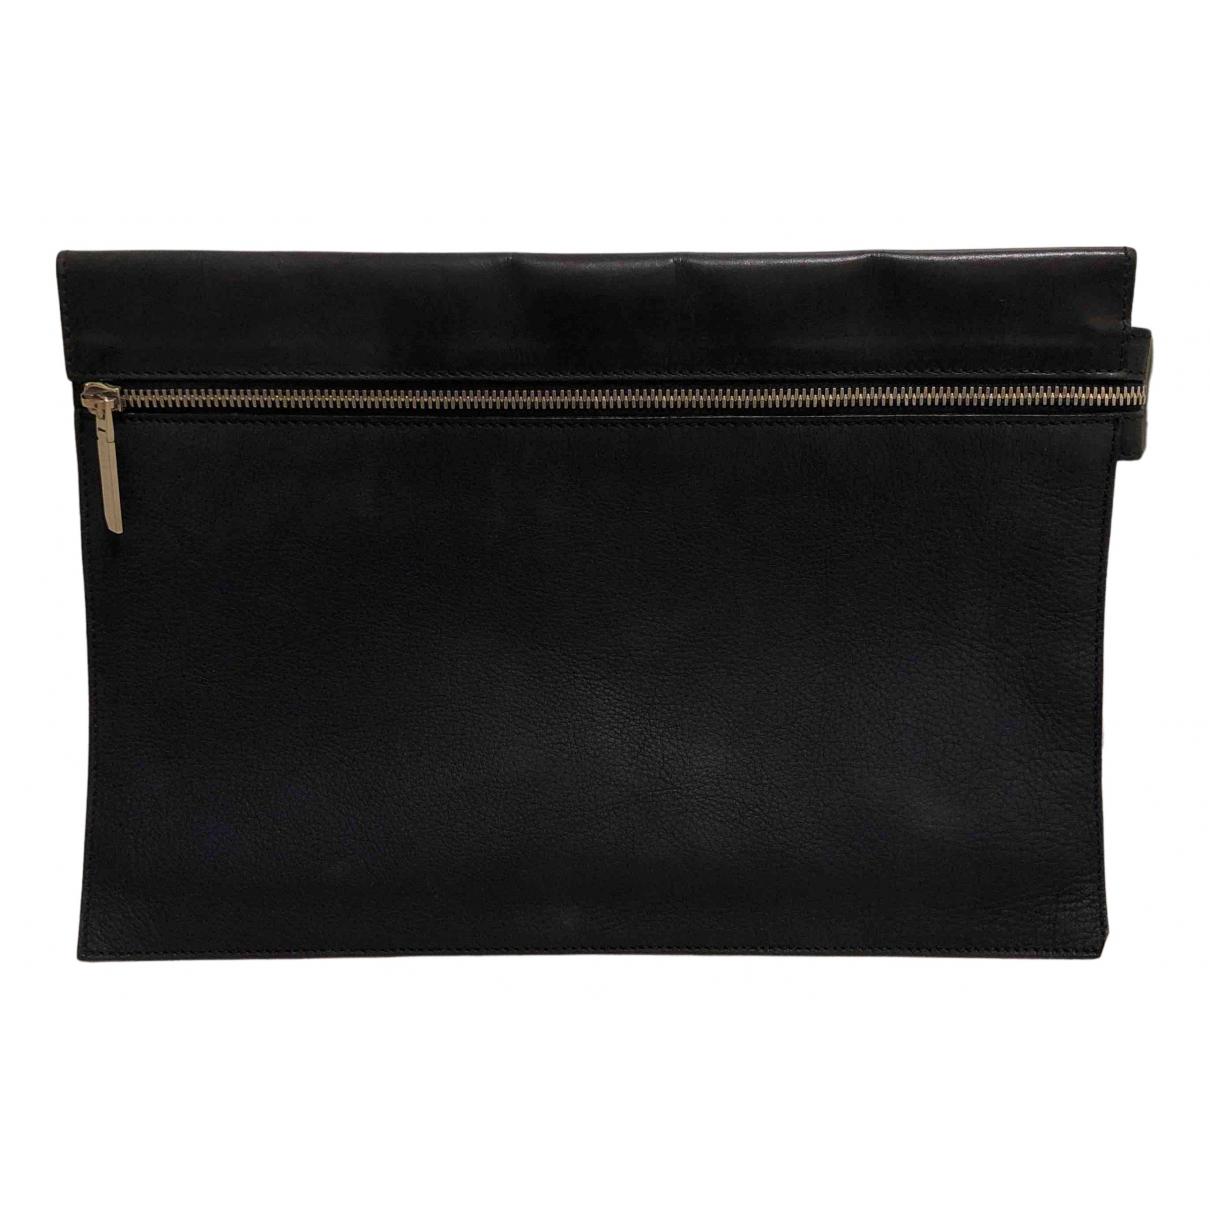 Victoria Beckham N Navy Leather Clutch bag for Women N